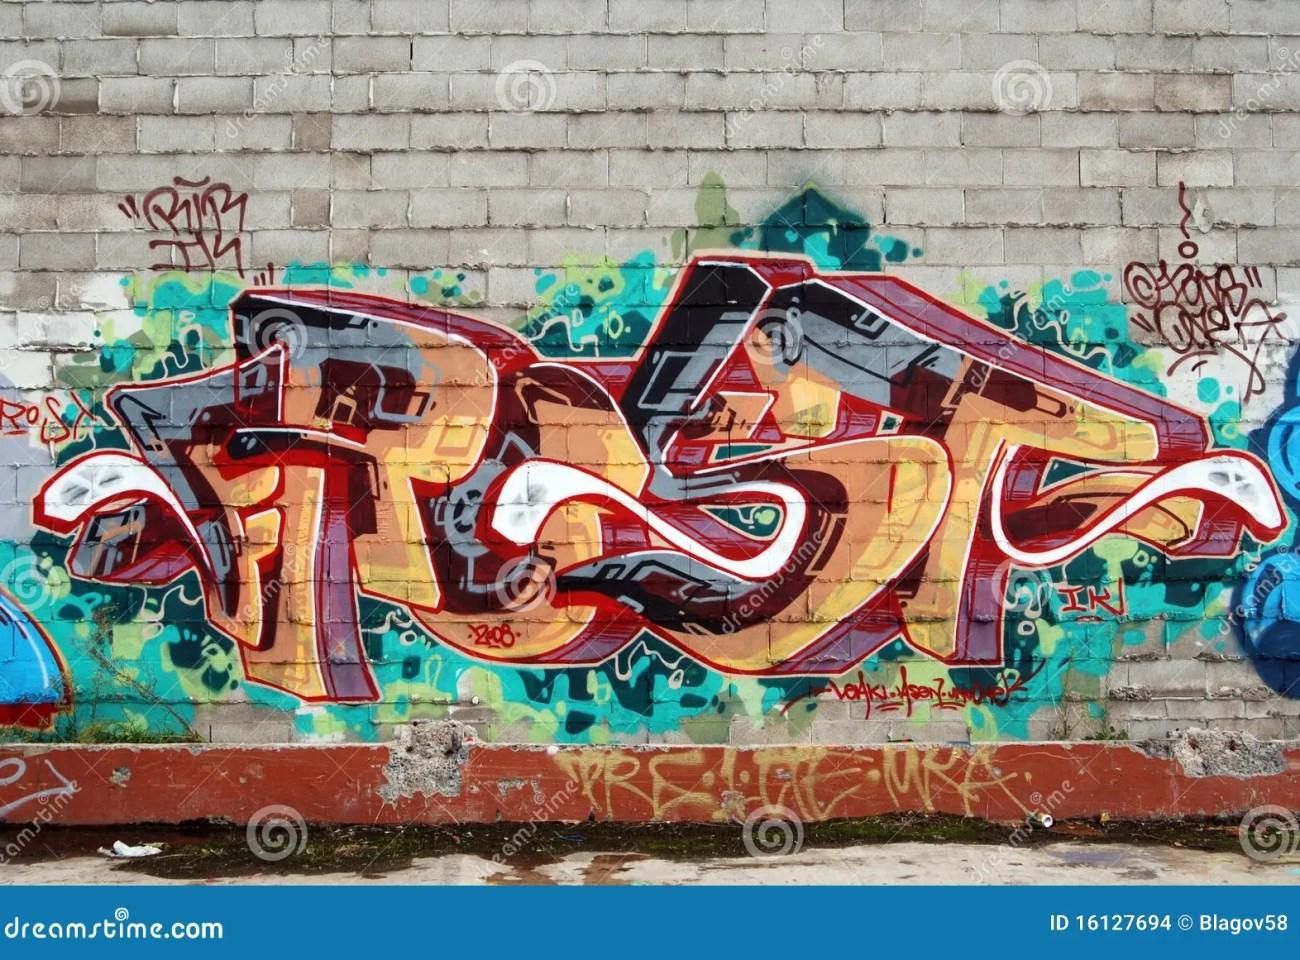 a wall vandalized with street graffiti art stock photo - image of